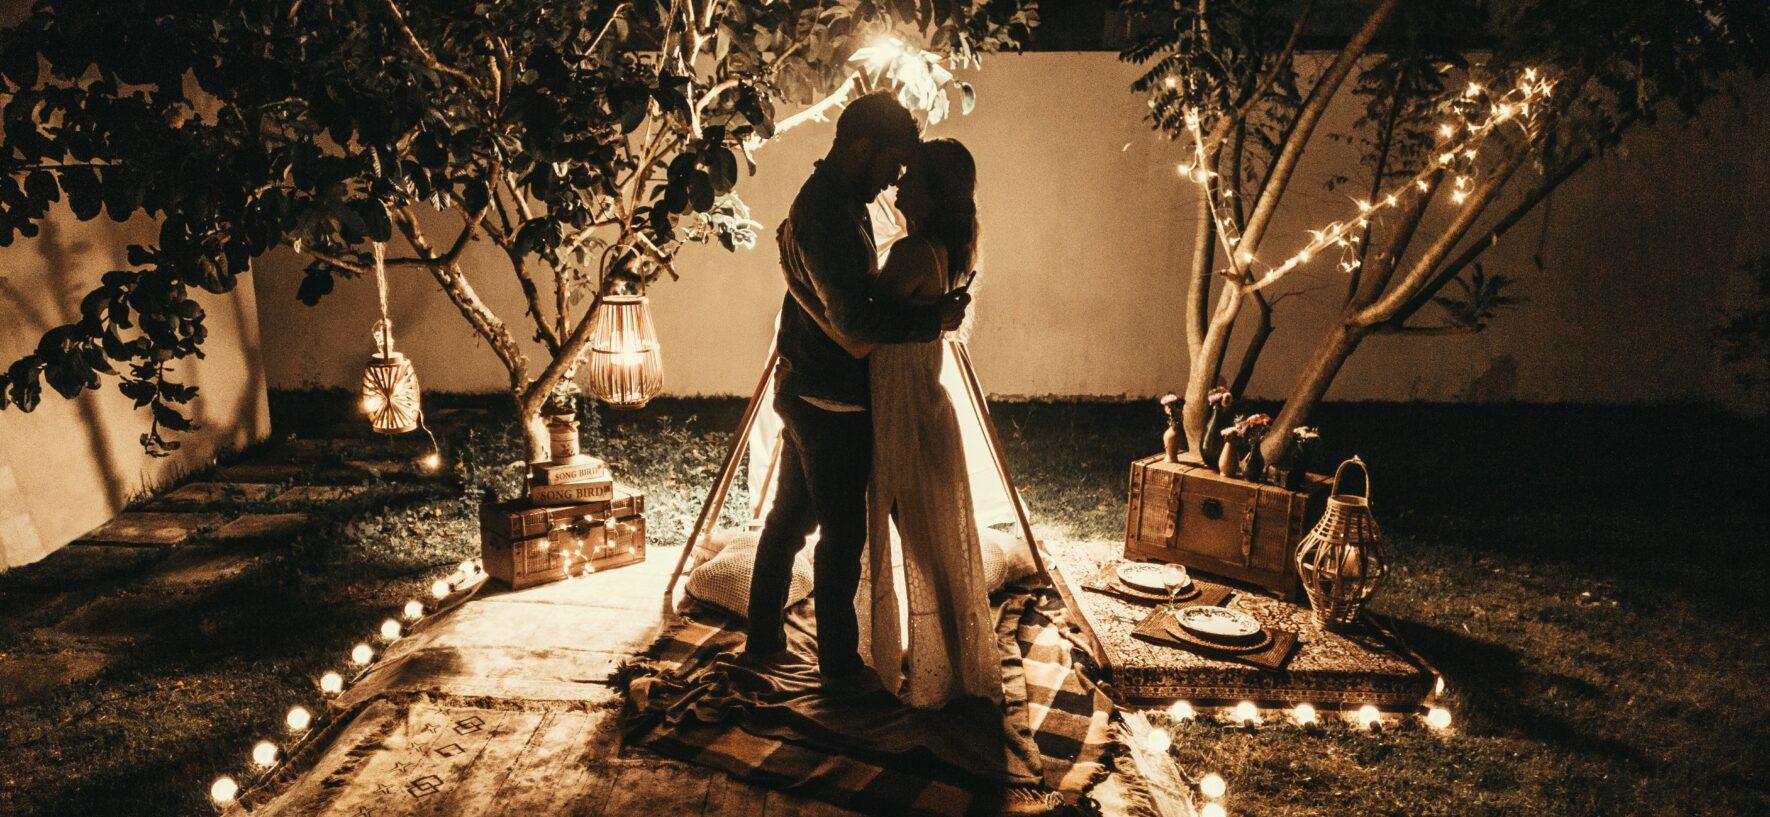 Choosing a Wedding Song